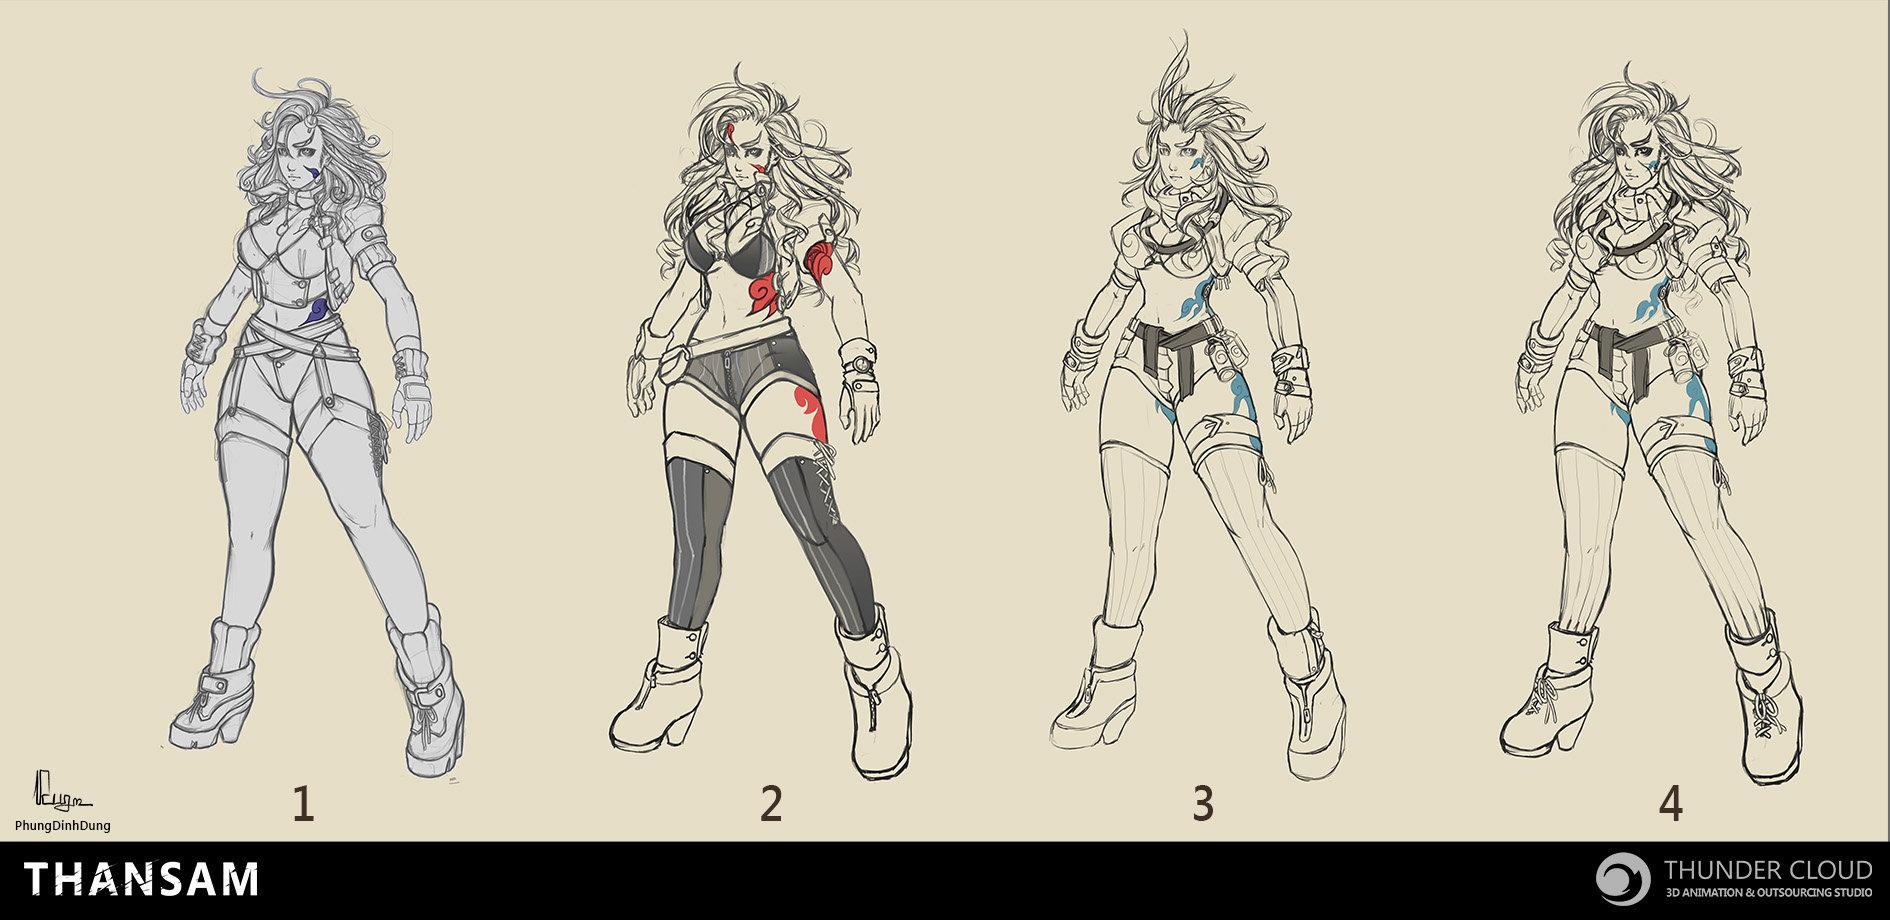 dzung-phung-dinh-electrika-concept.jpg?1432830724